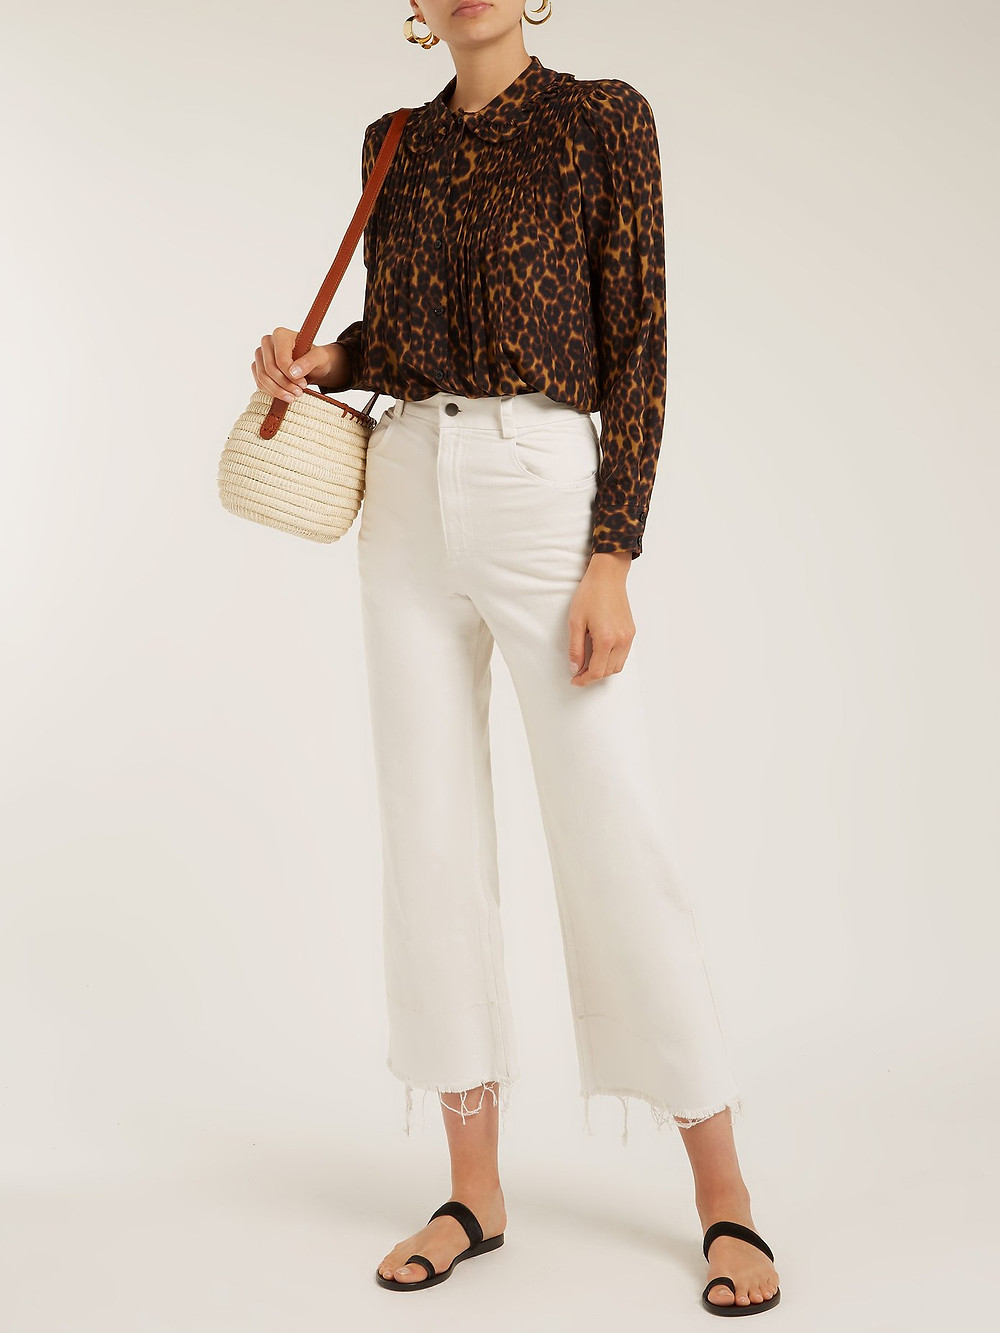 Masscob Leopard-print ruffled-collar blouse $354